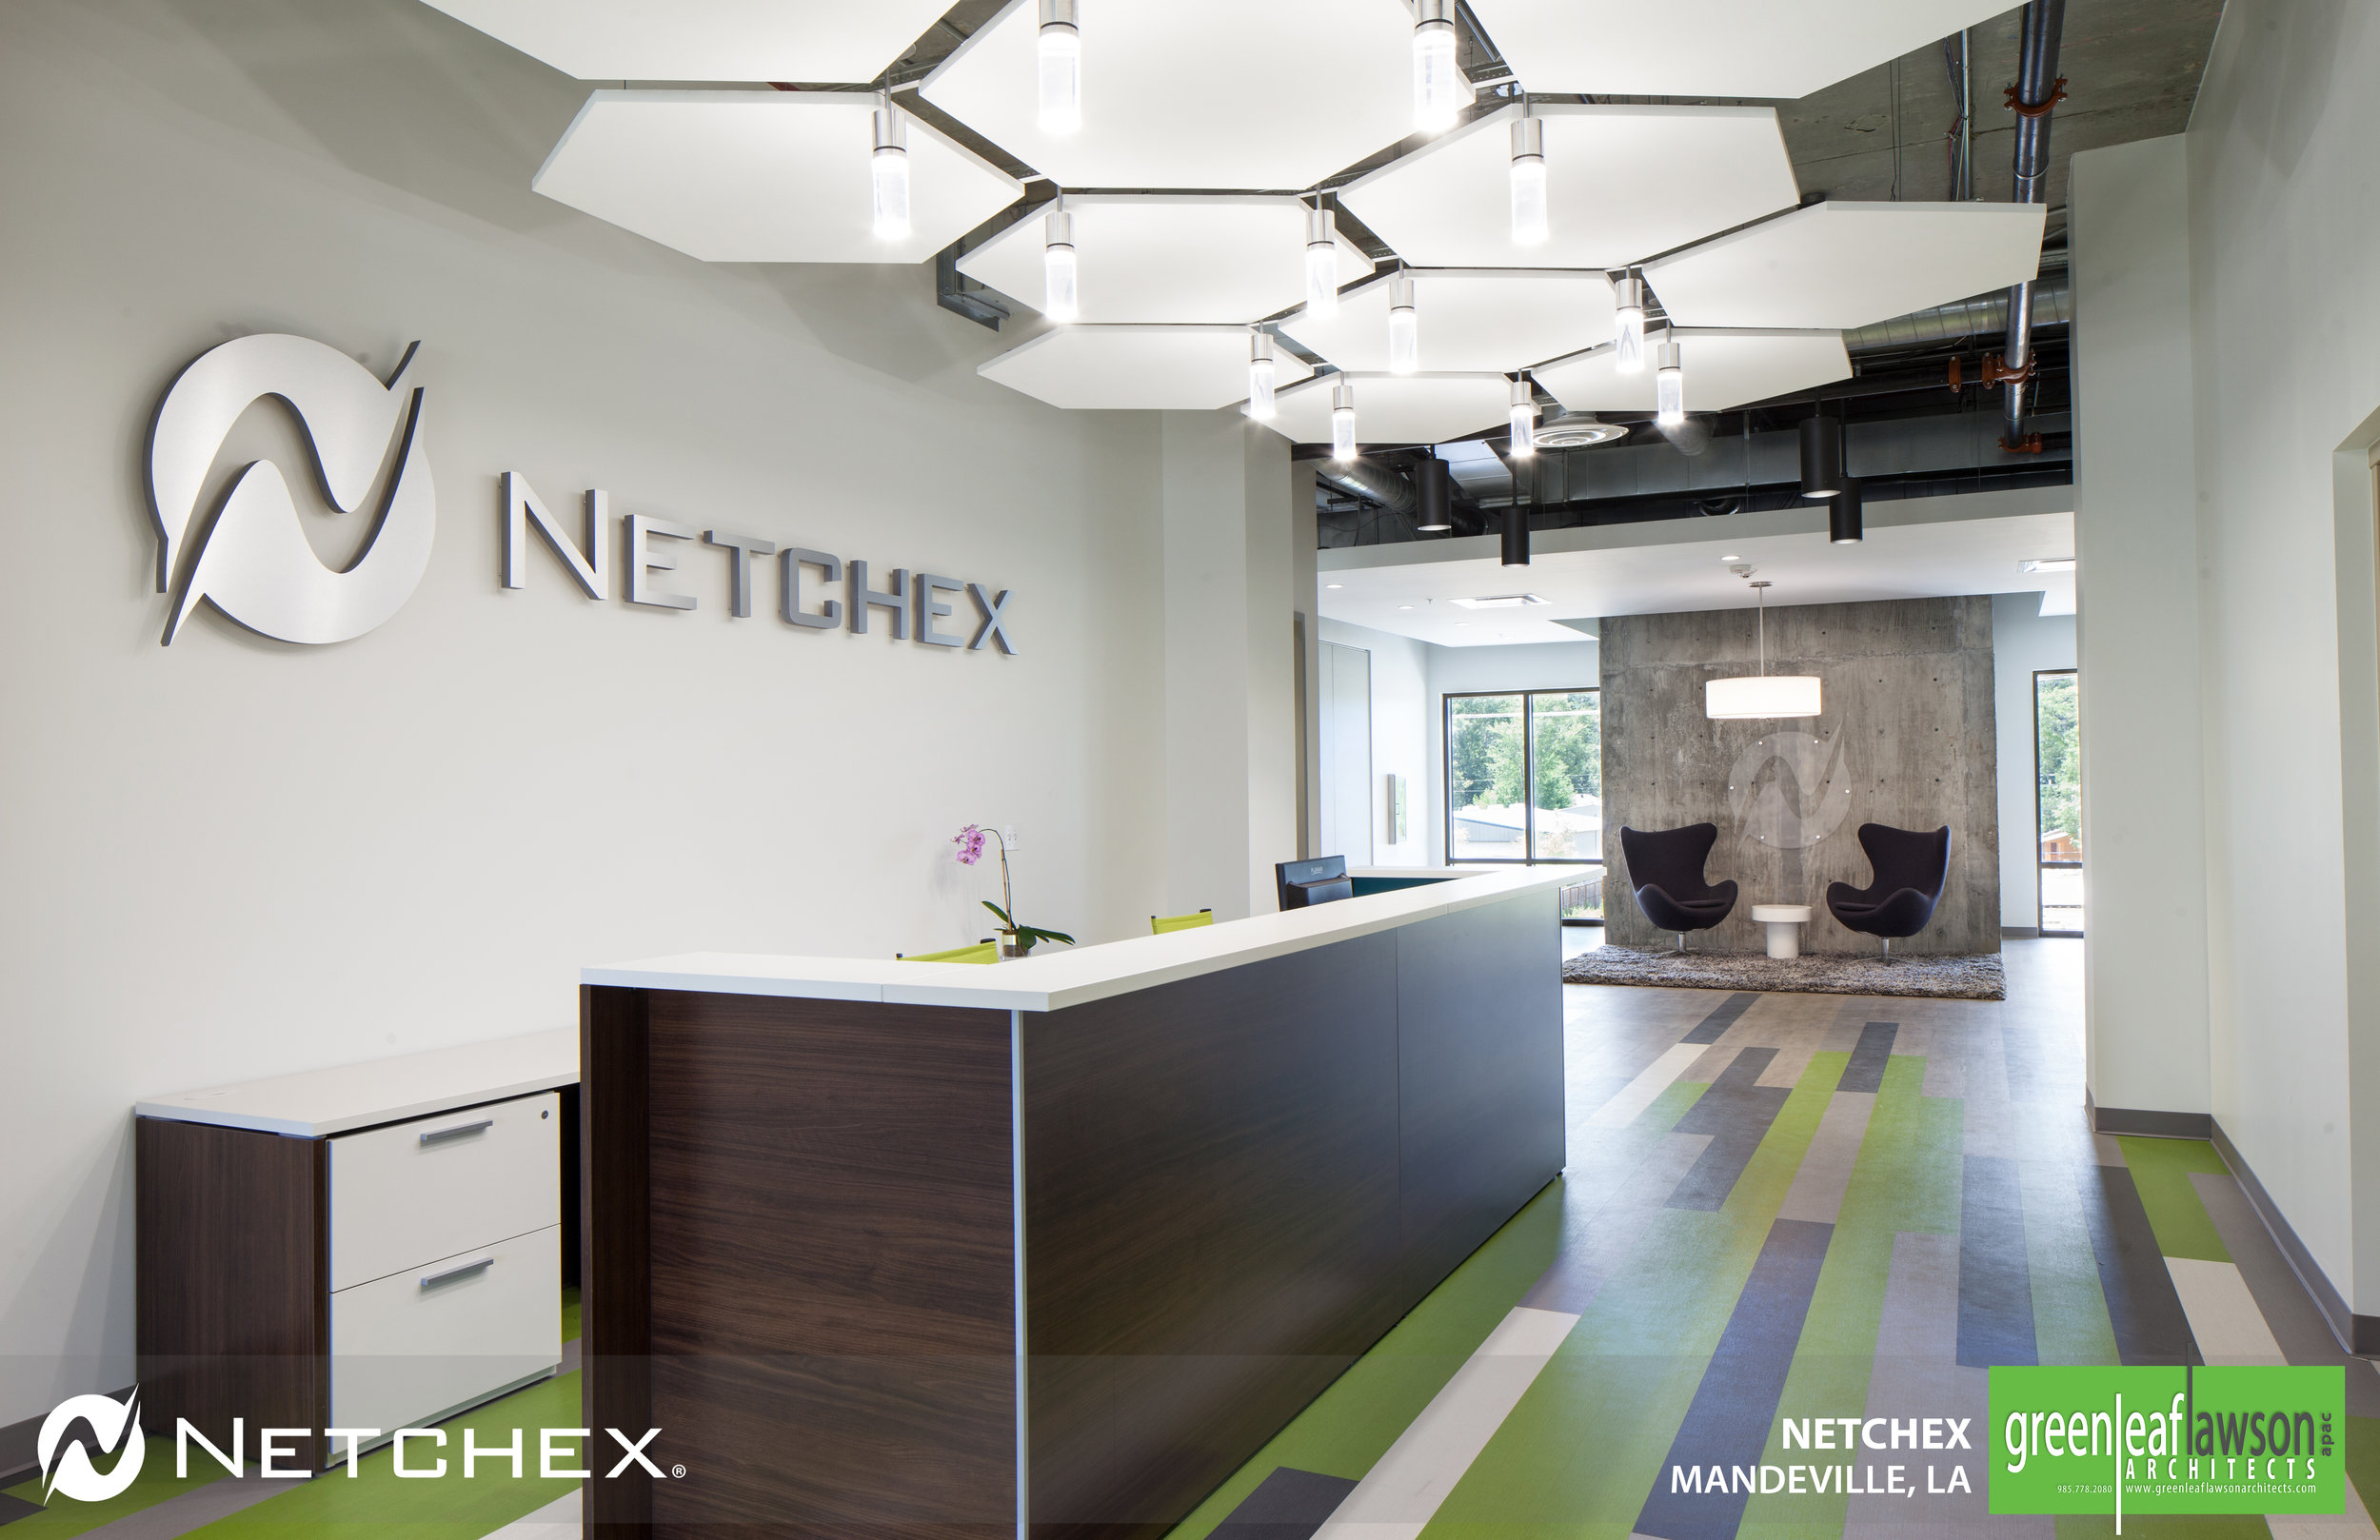 Netchex_1.jpg